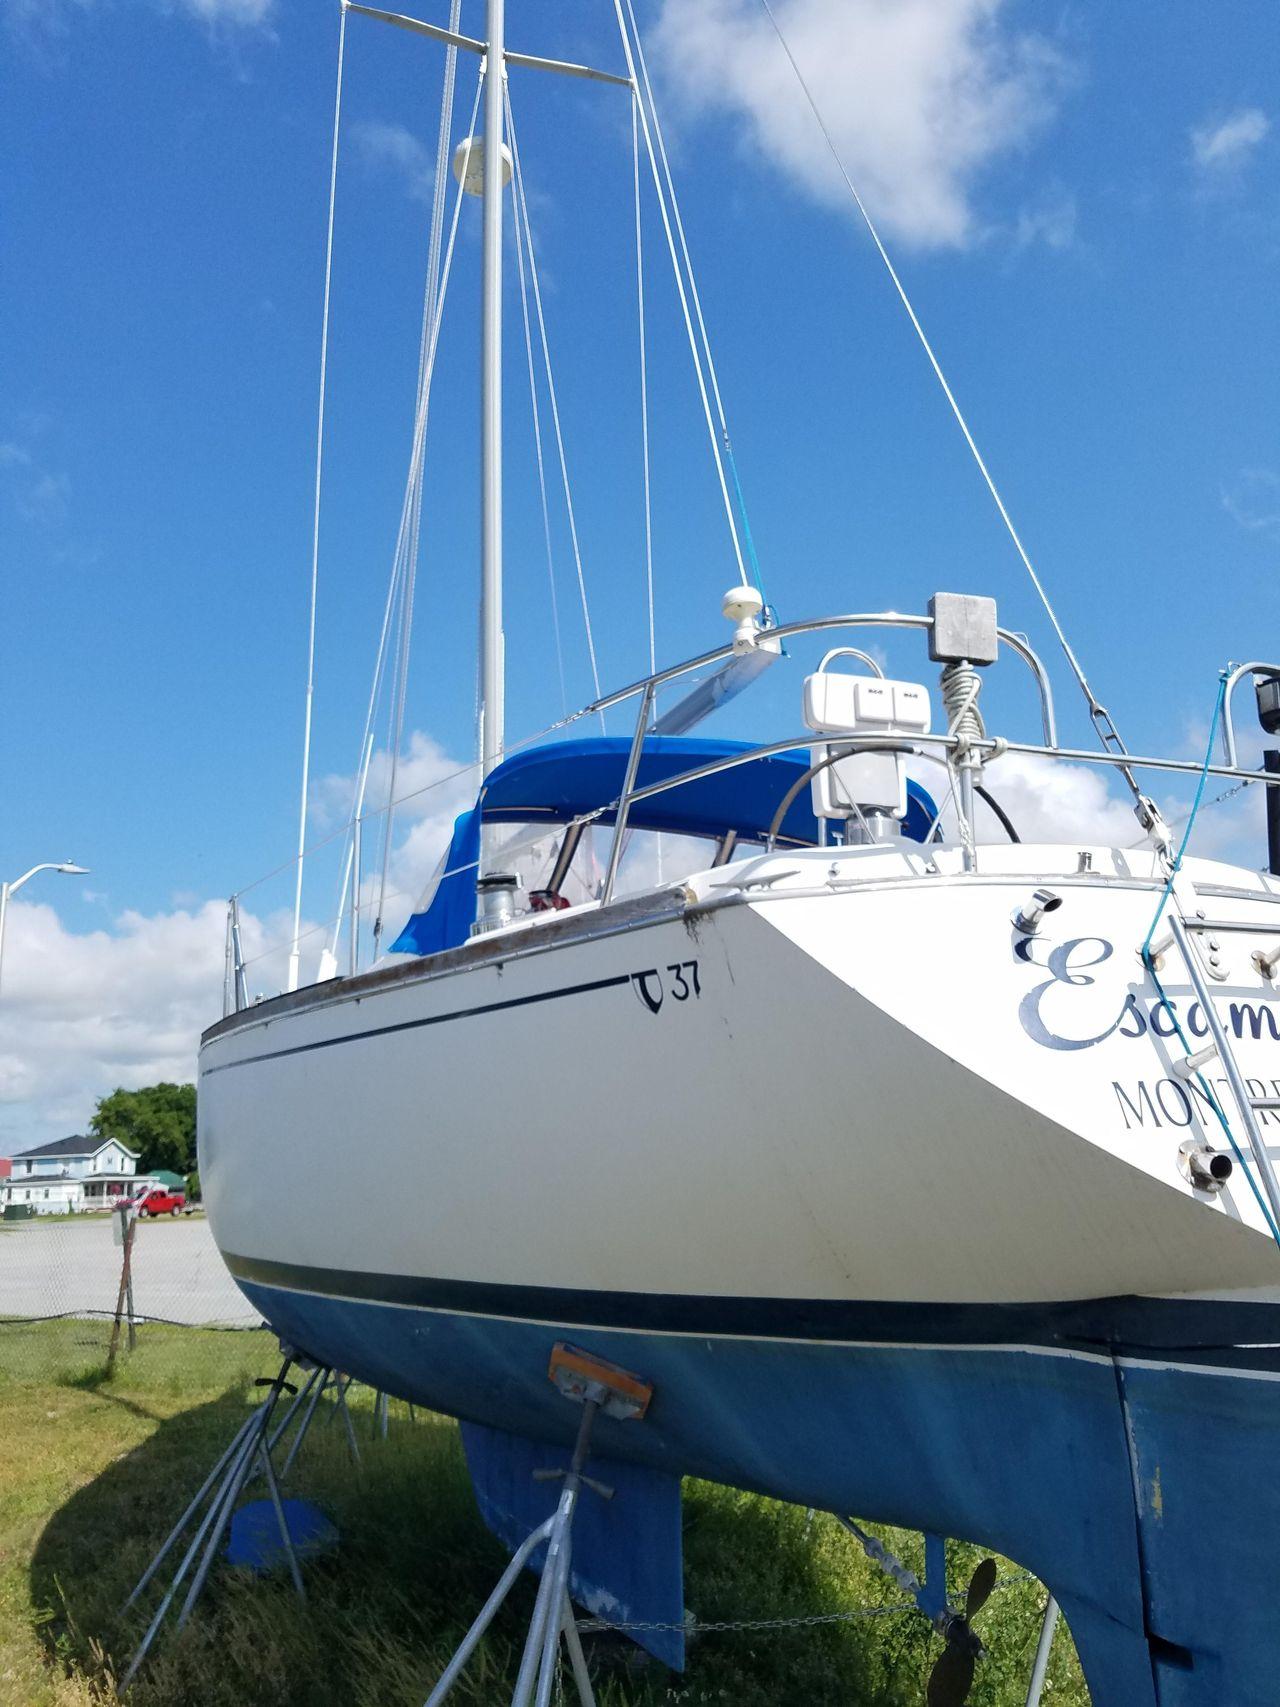 1984 Used Tartan 37 Cruiser Sailboat For Sale - $47,500